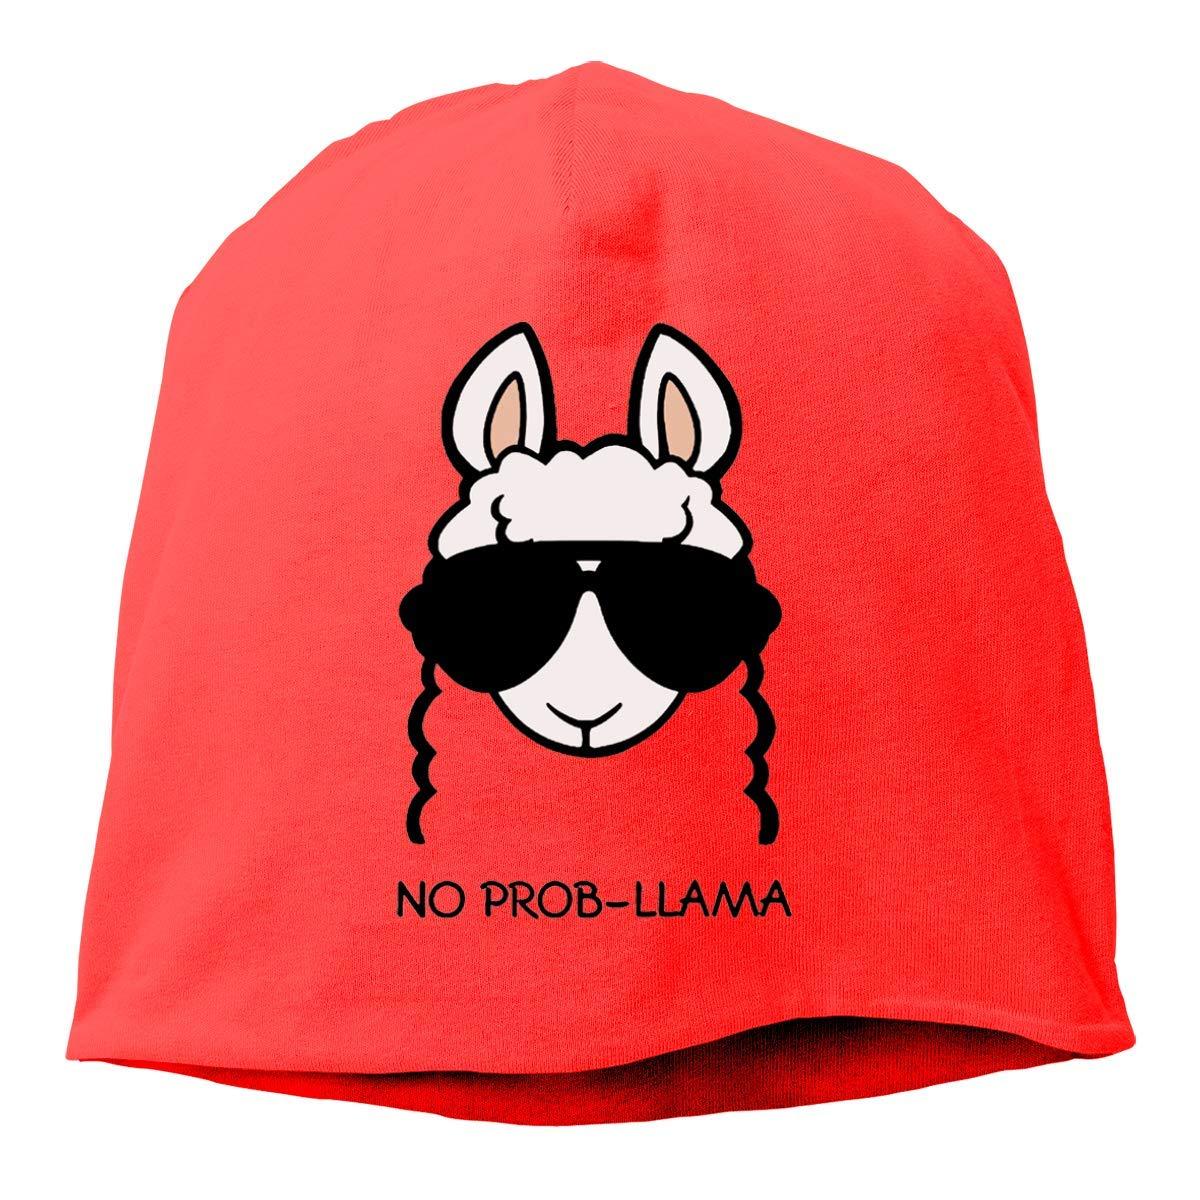 5ef64532253 Get Quotations · Joseph Maszeroski Cartoon Funny No Prob Llama Sunglasses  Soft Cotton Hat Warm Beanies Skull Cap